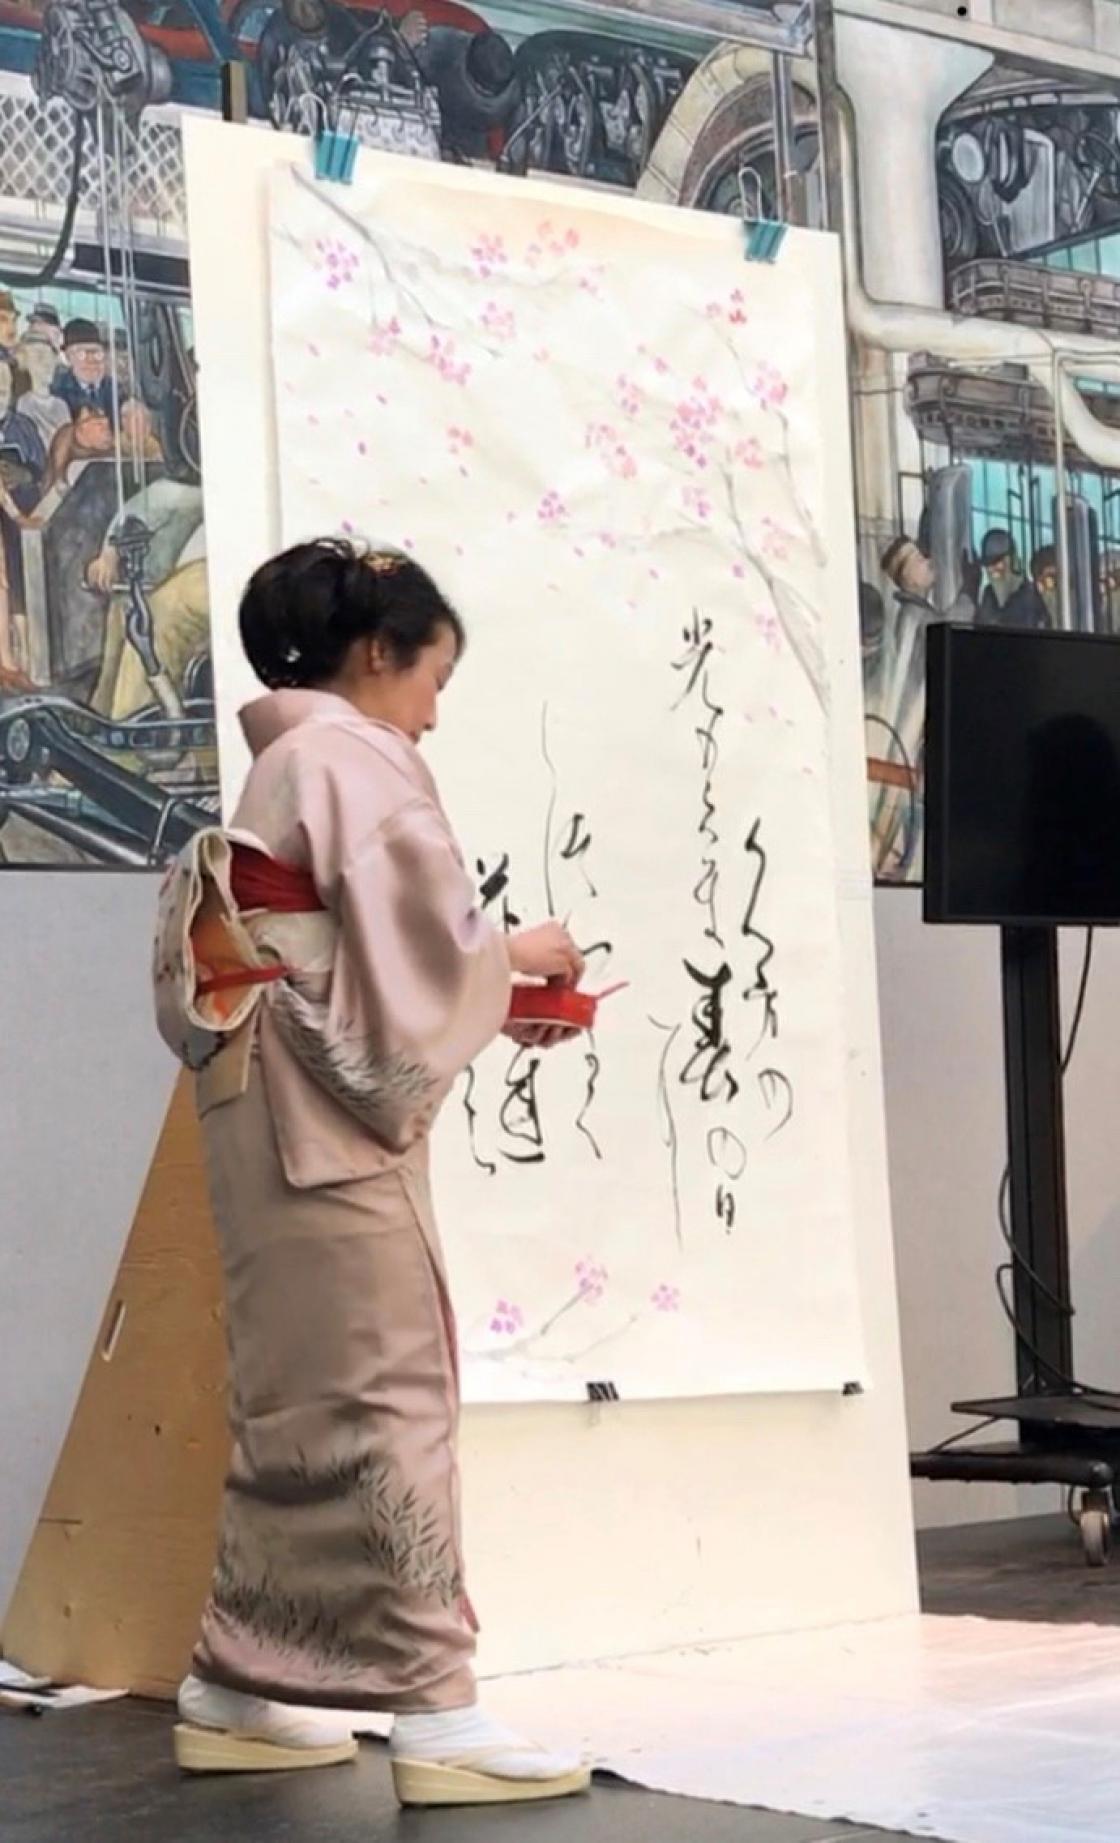 Kyoko Fujii demonstrating traditional Japanese calligraphy